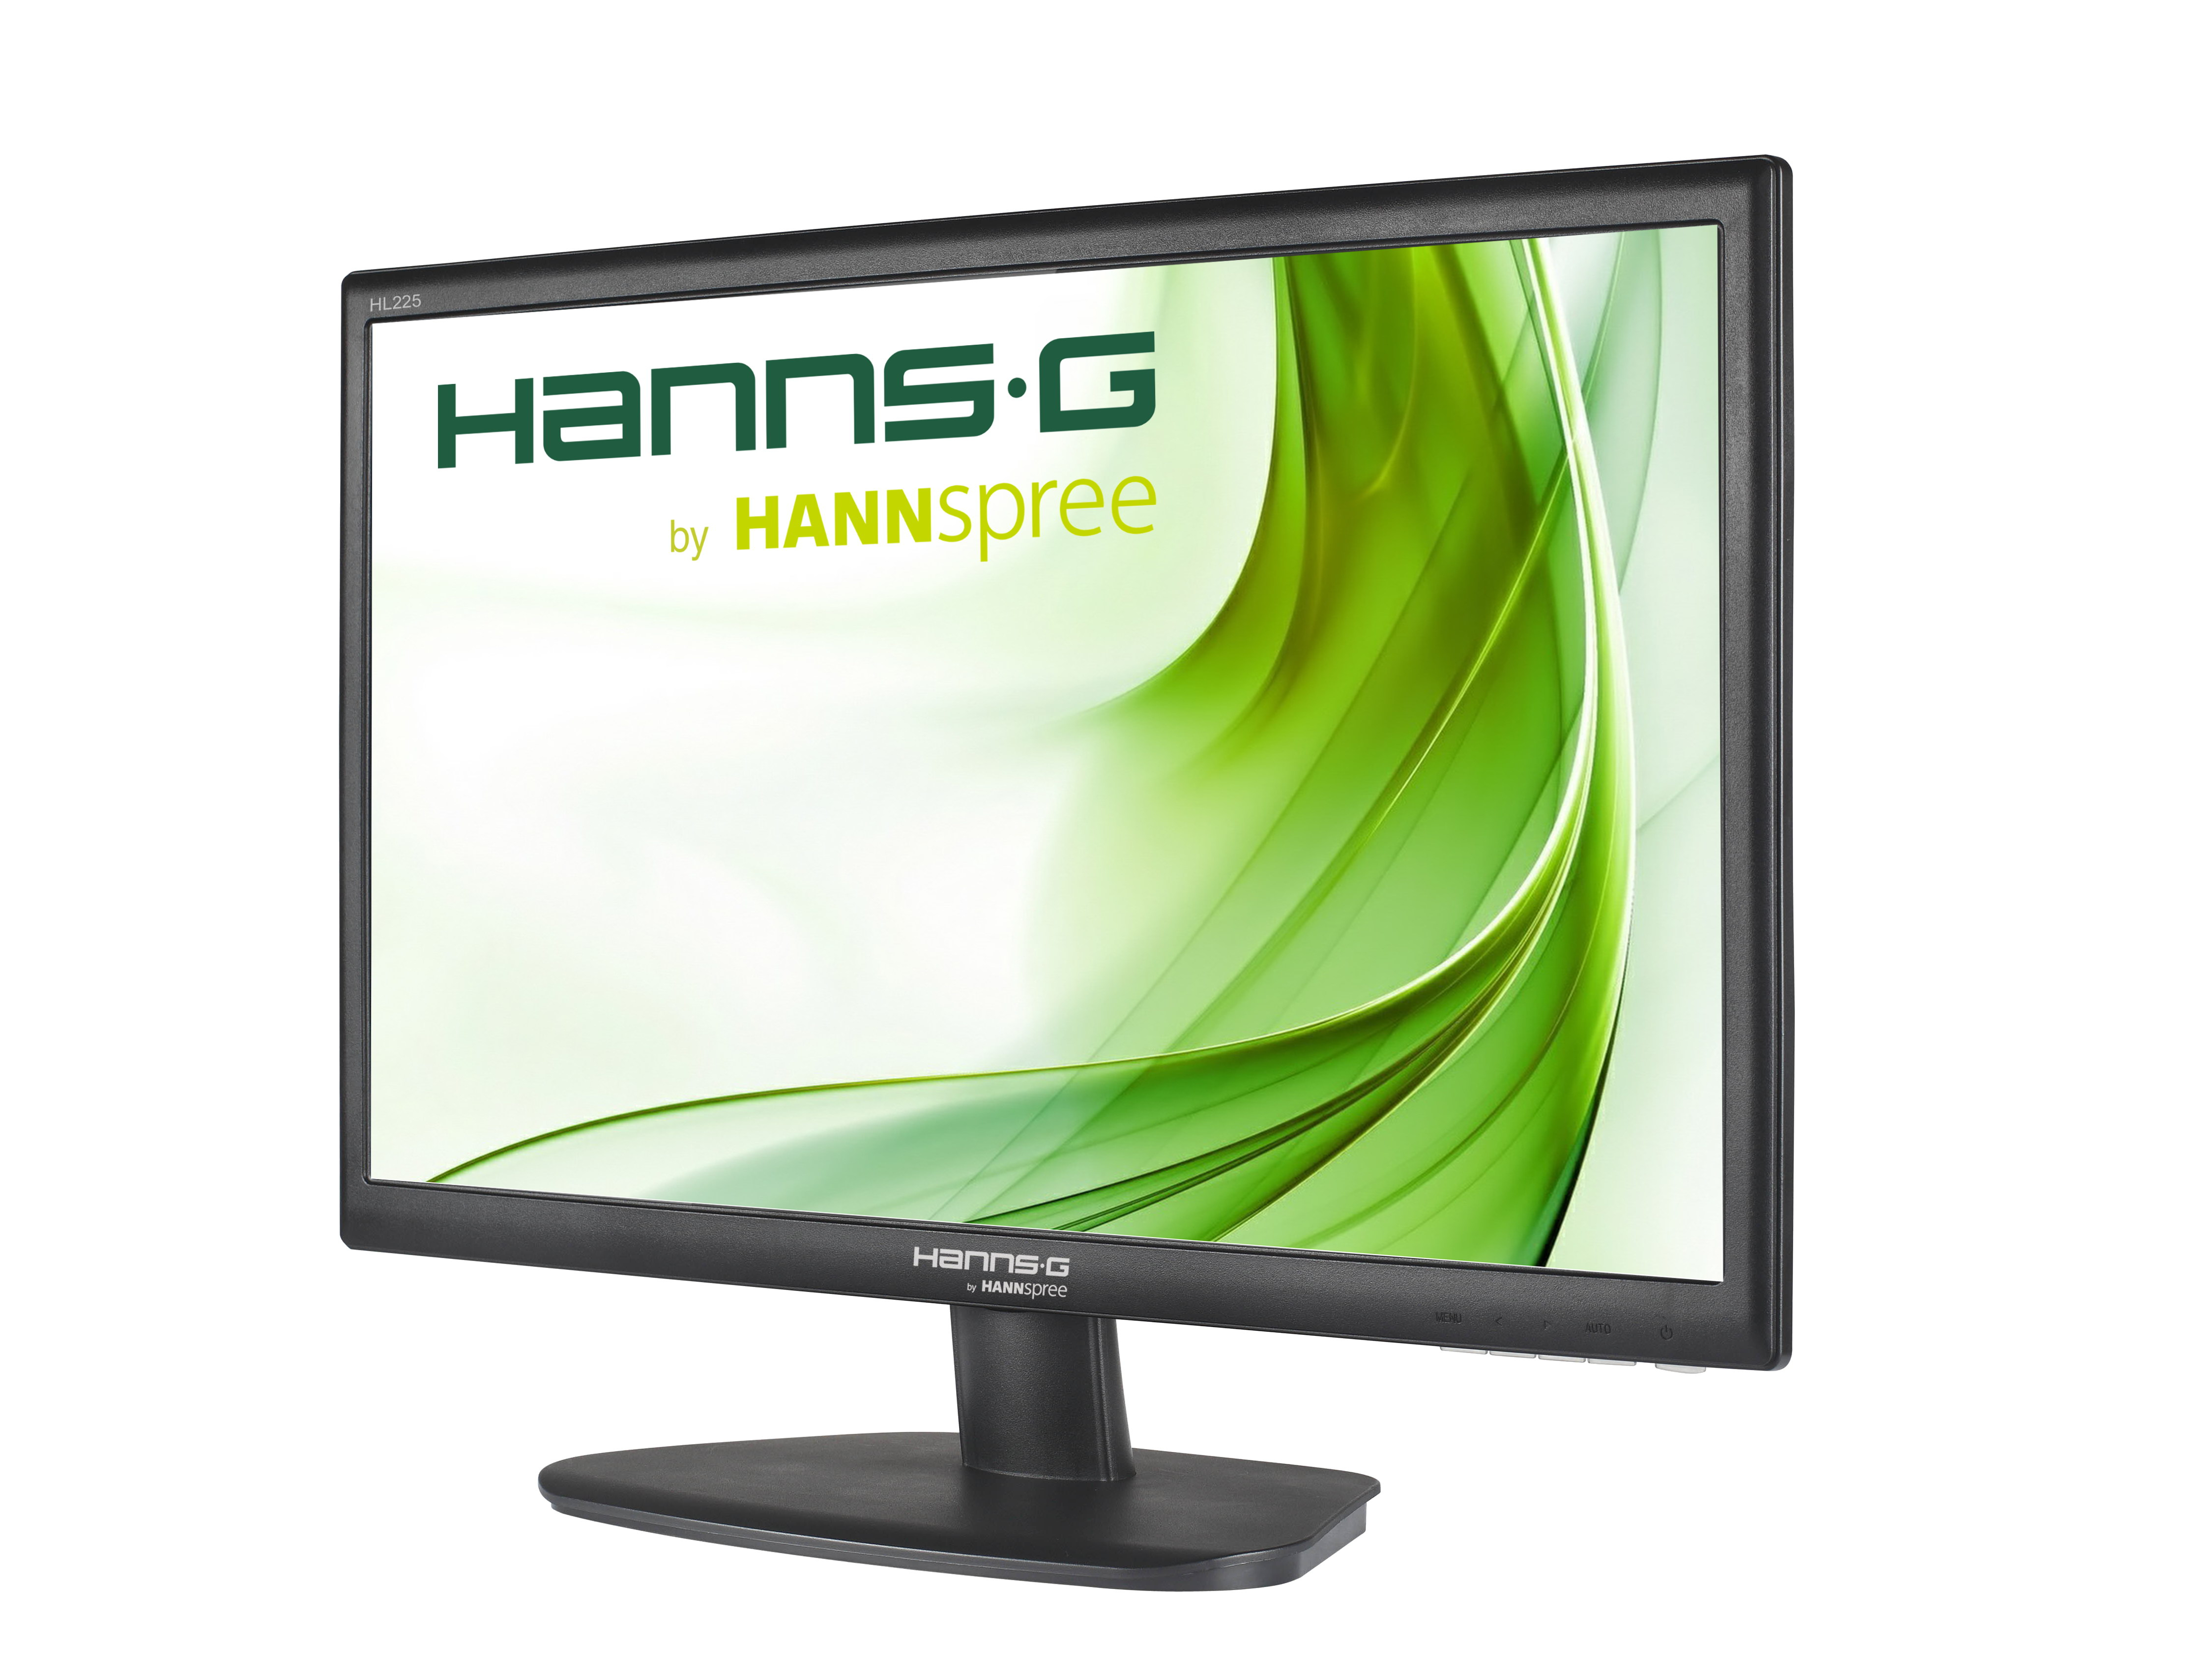 "Hannspree Hanns.G HL 225 PPB 21.5"" Full HD"